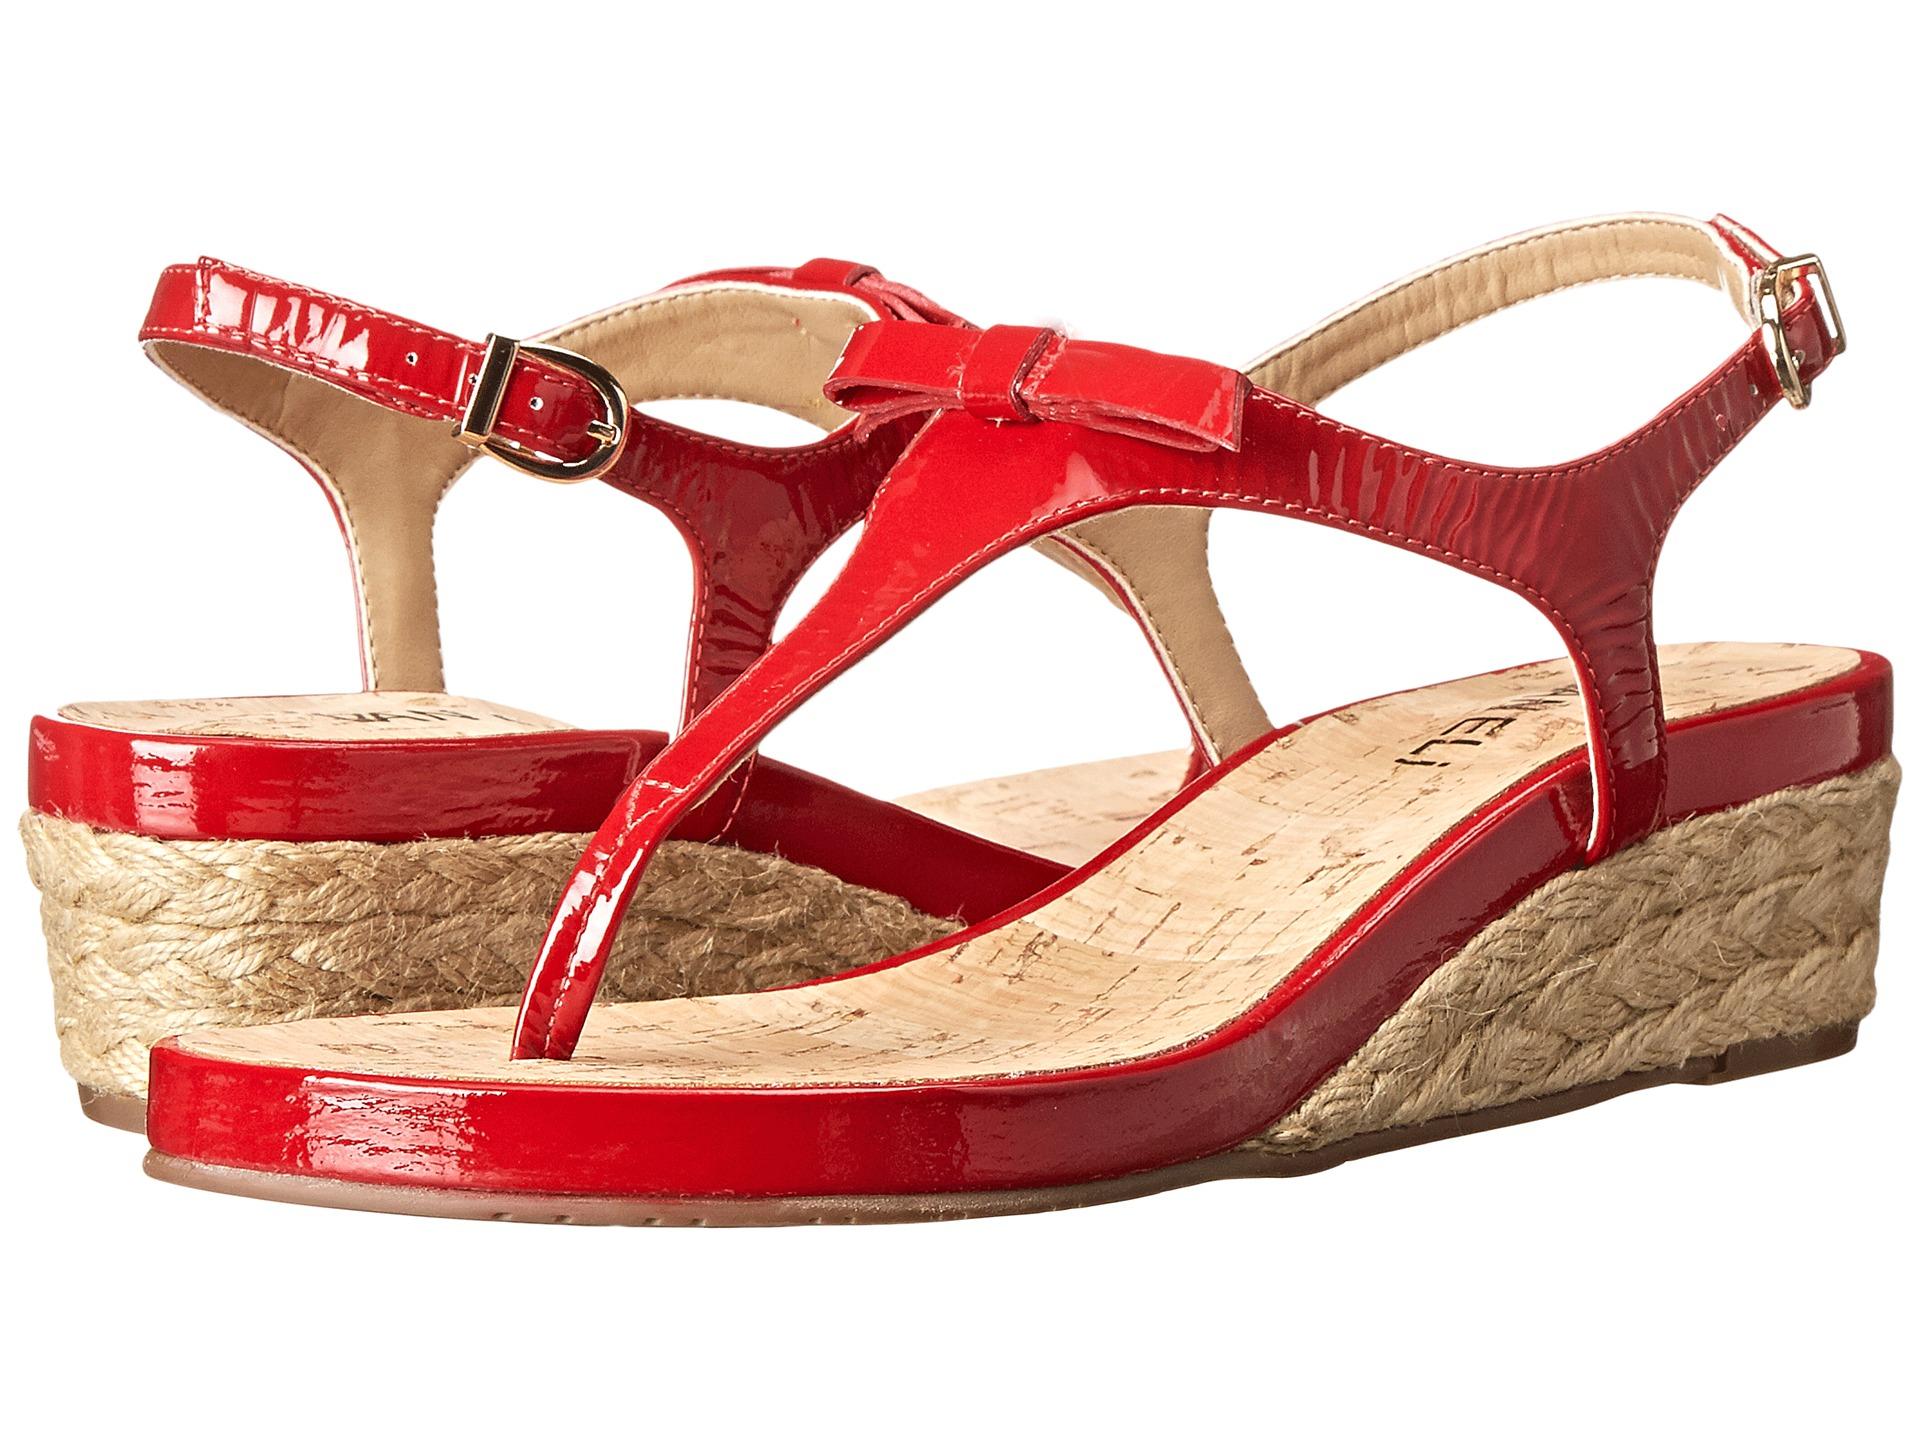 Womens Sandals Vaneli Kiliana Red Krinkle Patent/Gold Buckle